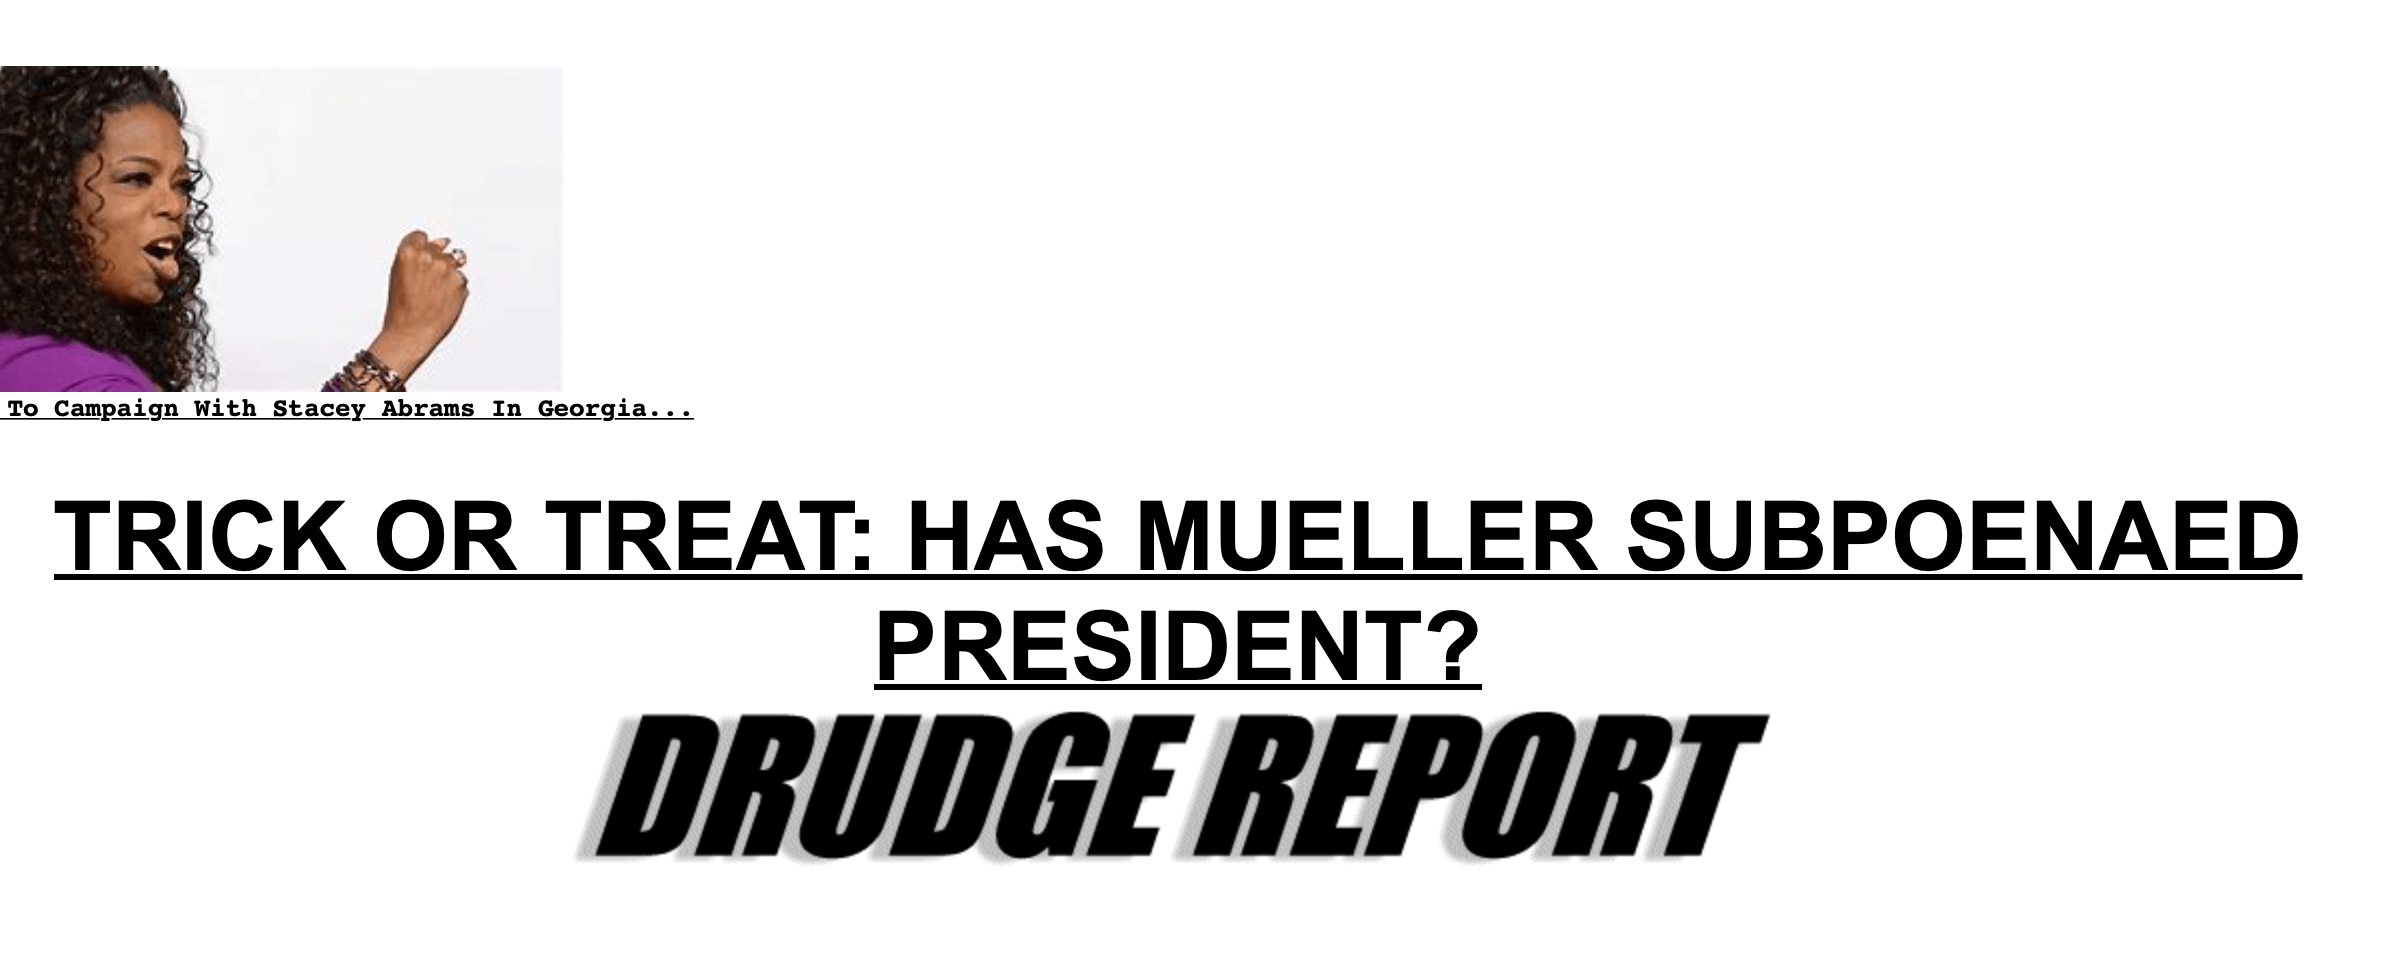 Has Robert Mueller Really Subpoenaed Trump